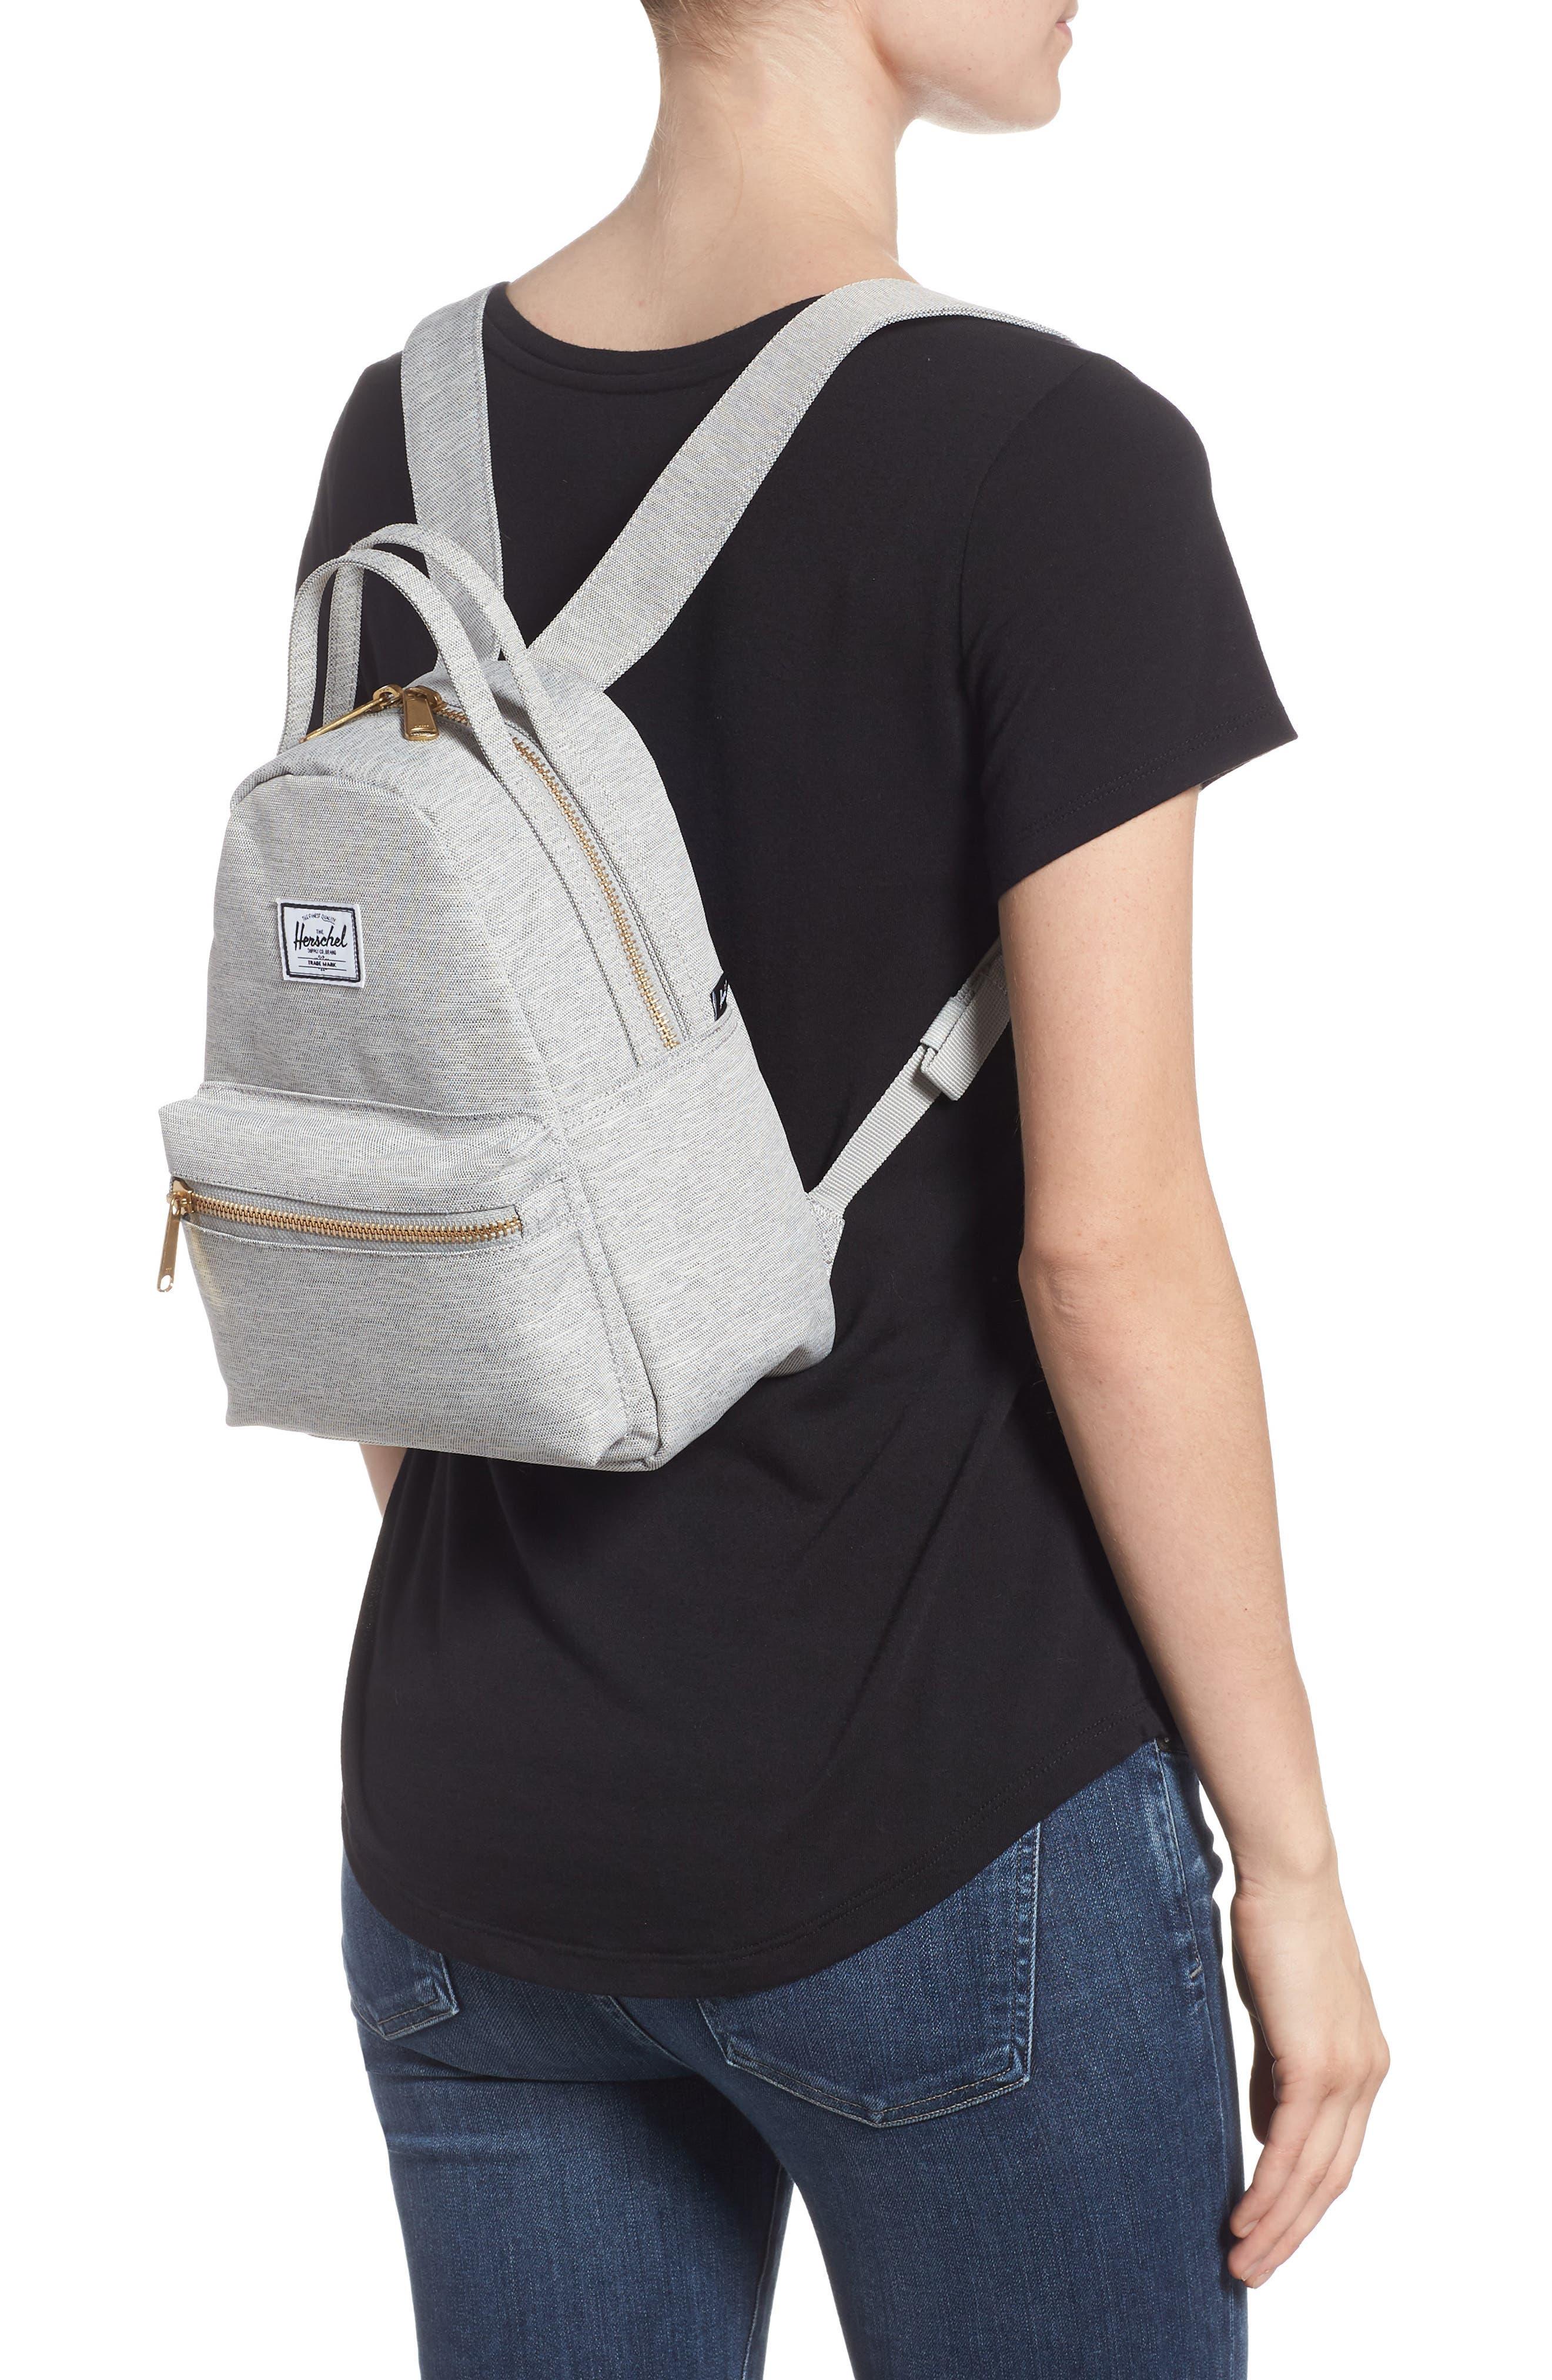 Mini Nova Backpack,                             Alternate thumbnail 2, color,                             LIGHT GREY CROSSHATCH